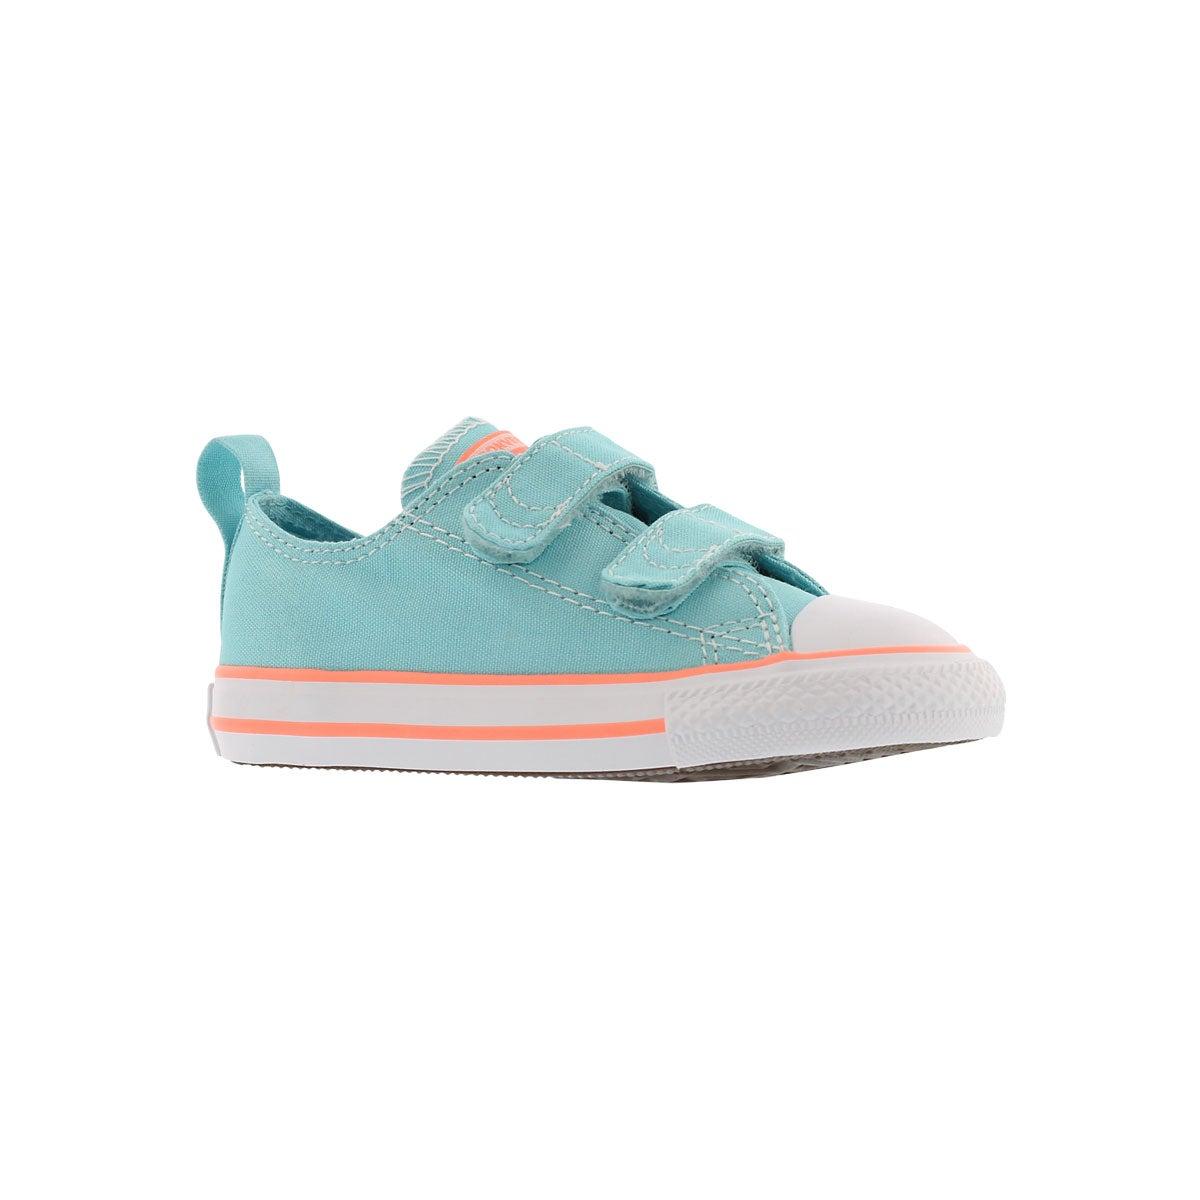 Infants' CT ALL STAR 2V bleached aqua sneakers